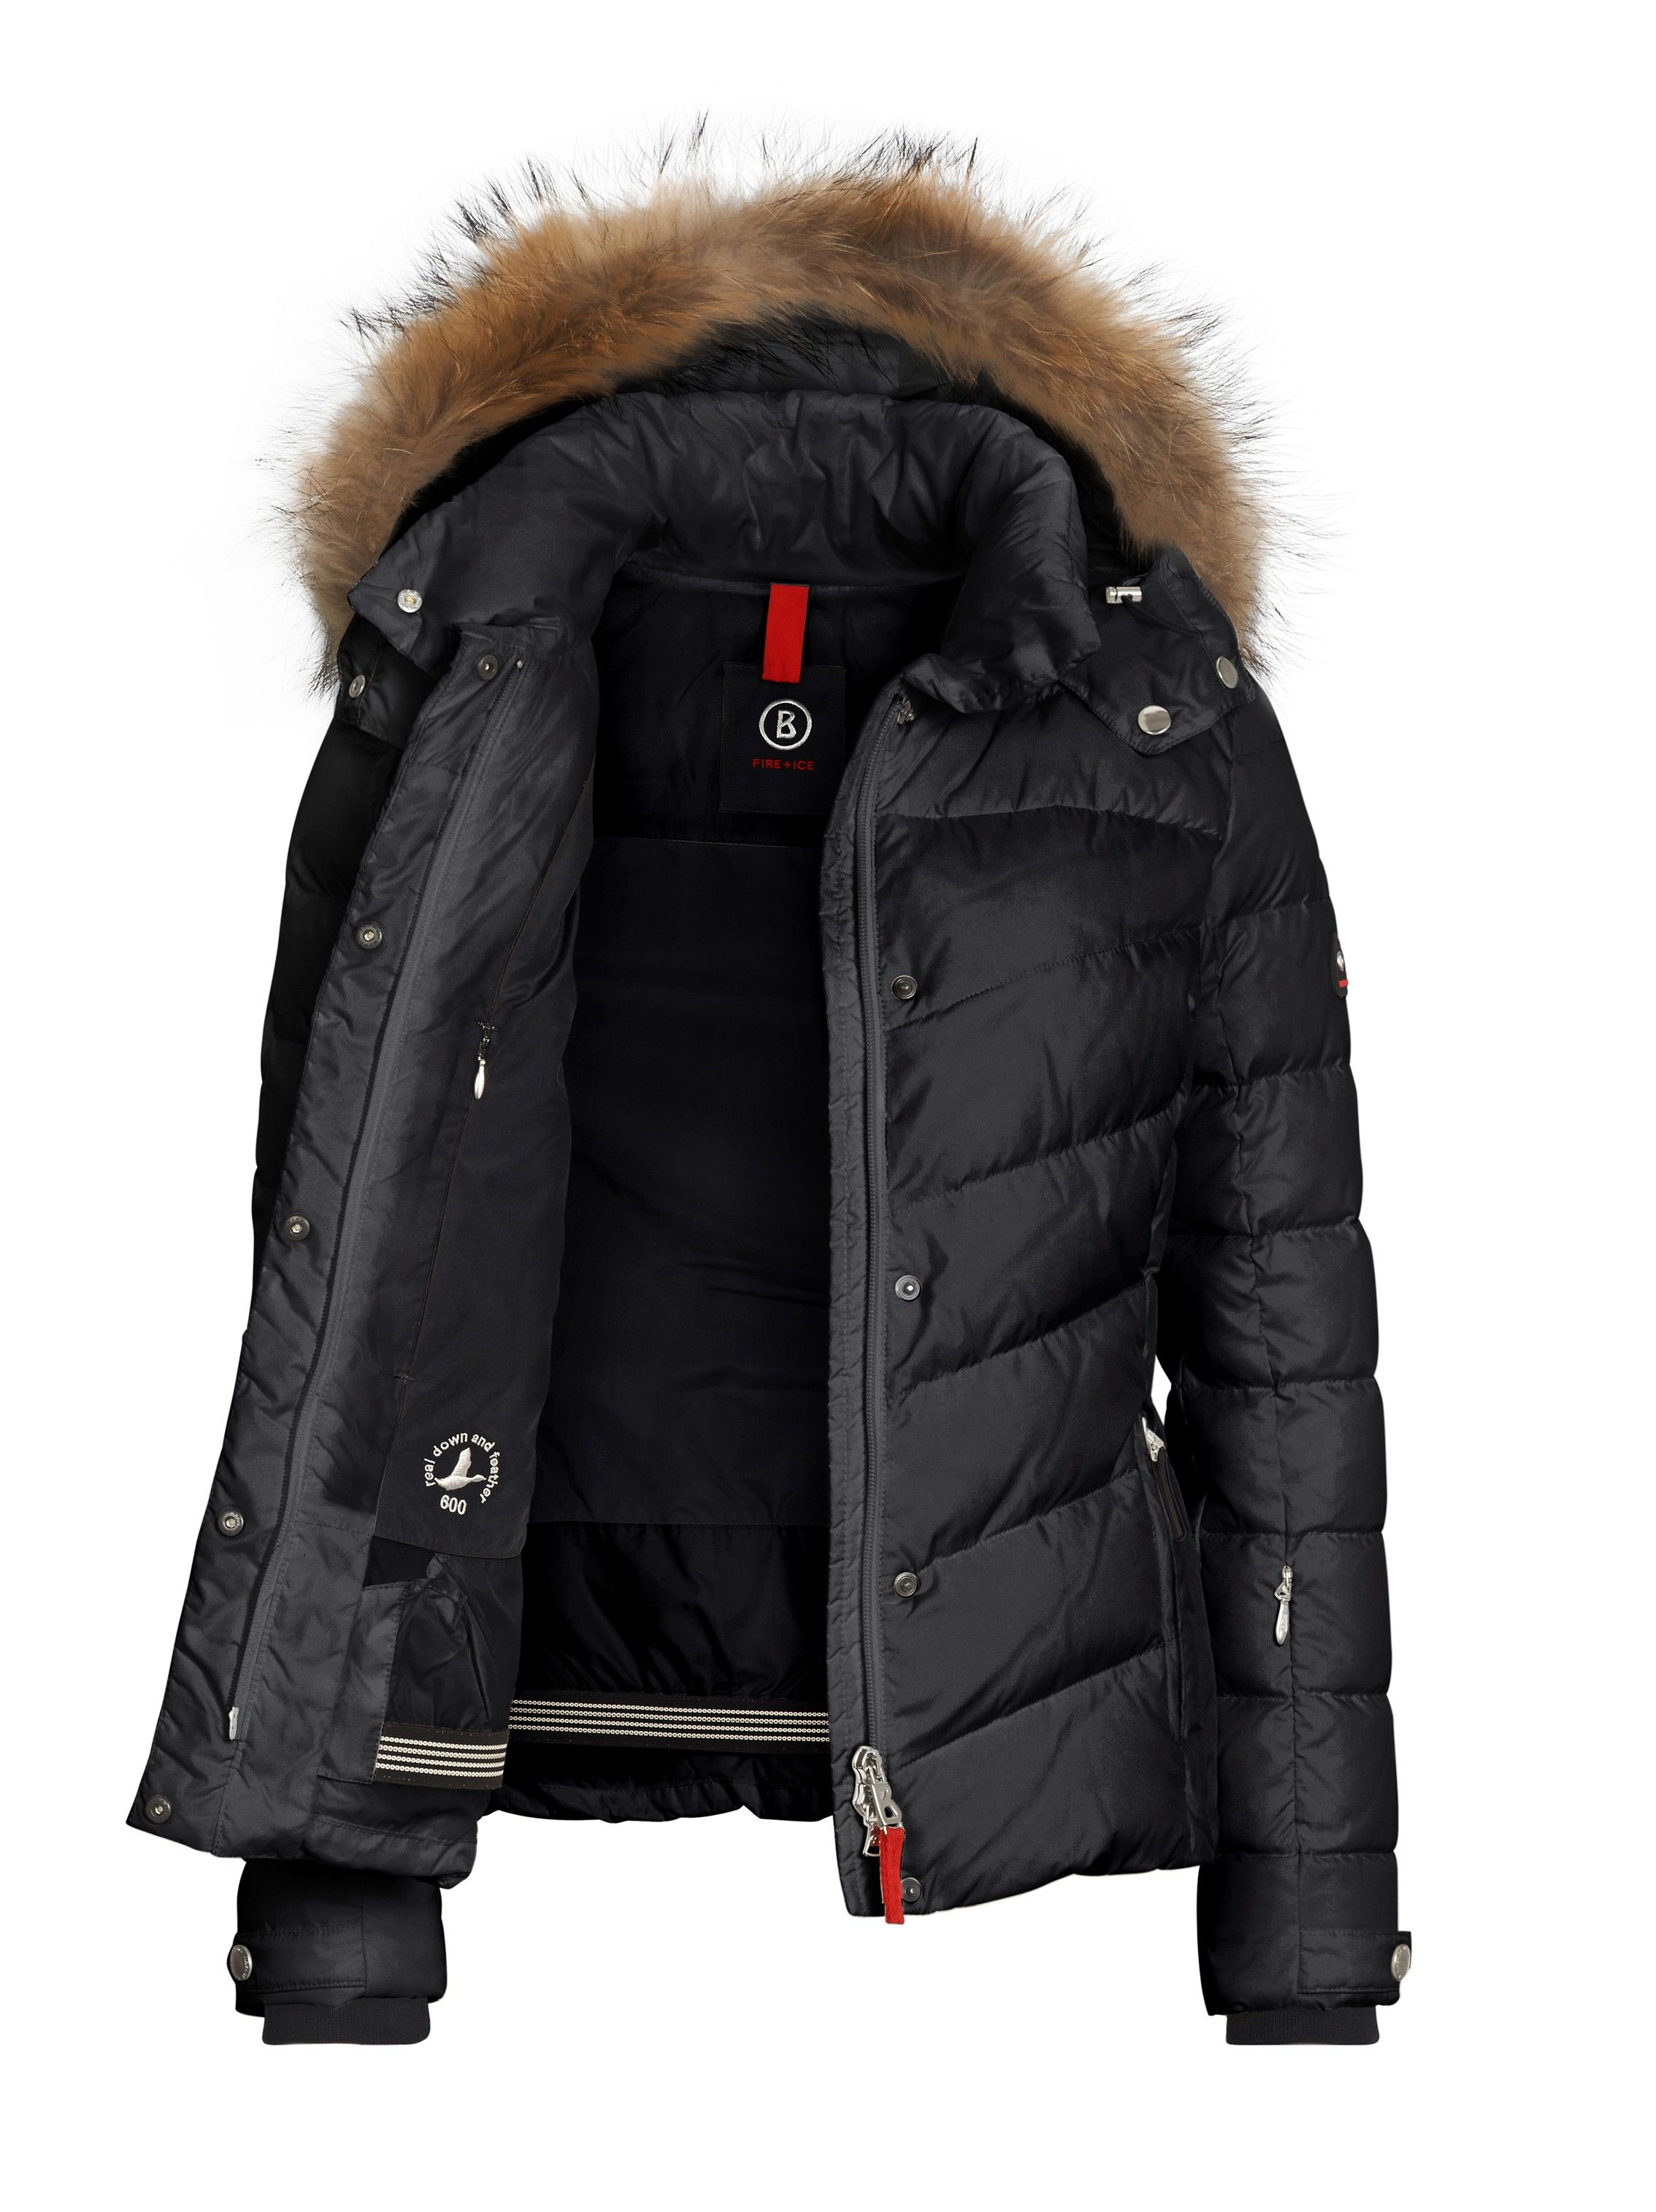 555b1ad4c Down Ski Jacket Sally-D - Black - order at Bogner   I want to wear ...